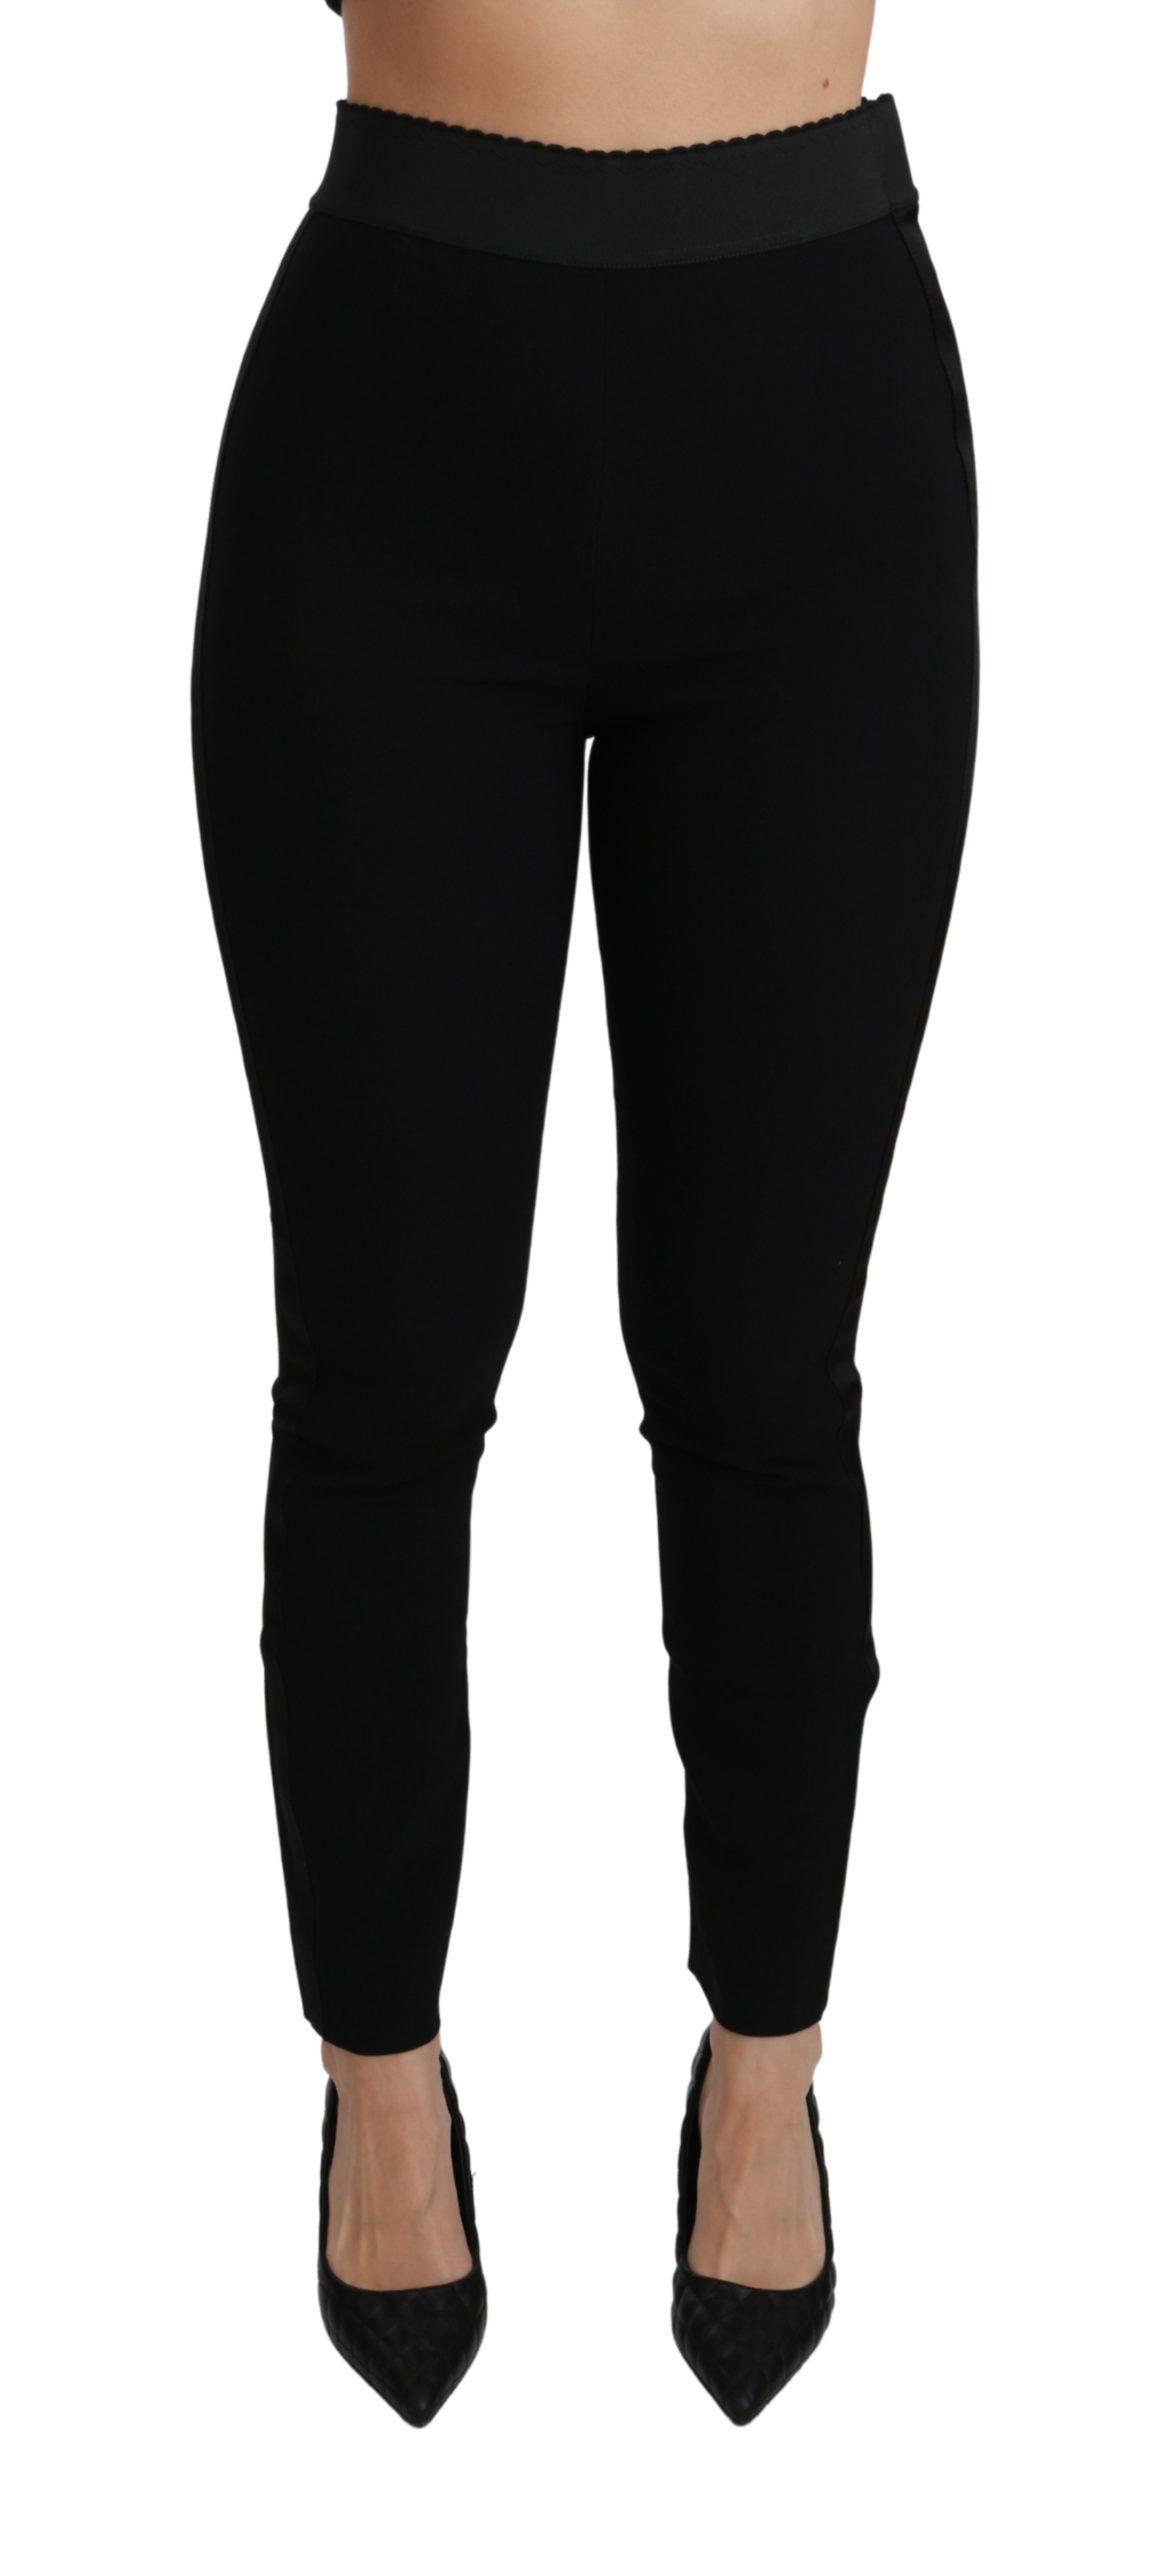 Dolce & Gabbana Women's Skinny High Waist Stretch Trouser Black PAN70894 - IT38|XS